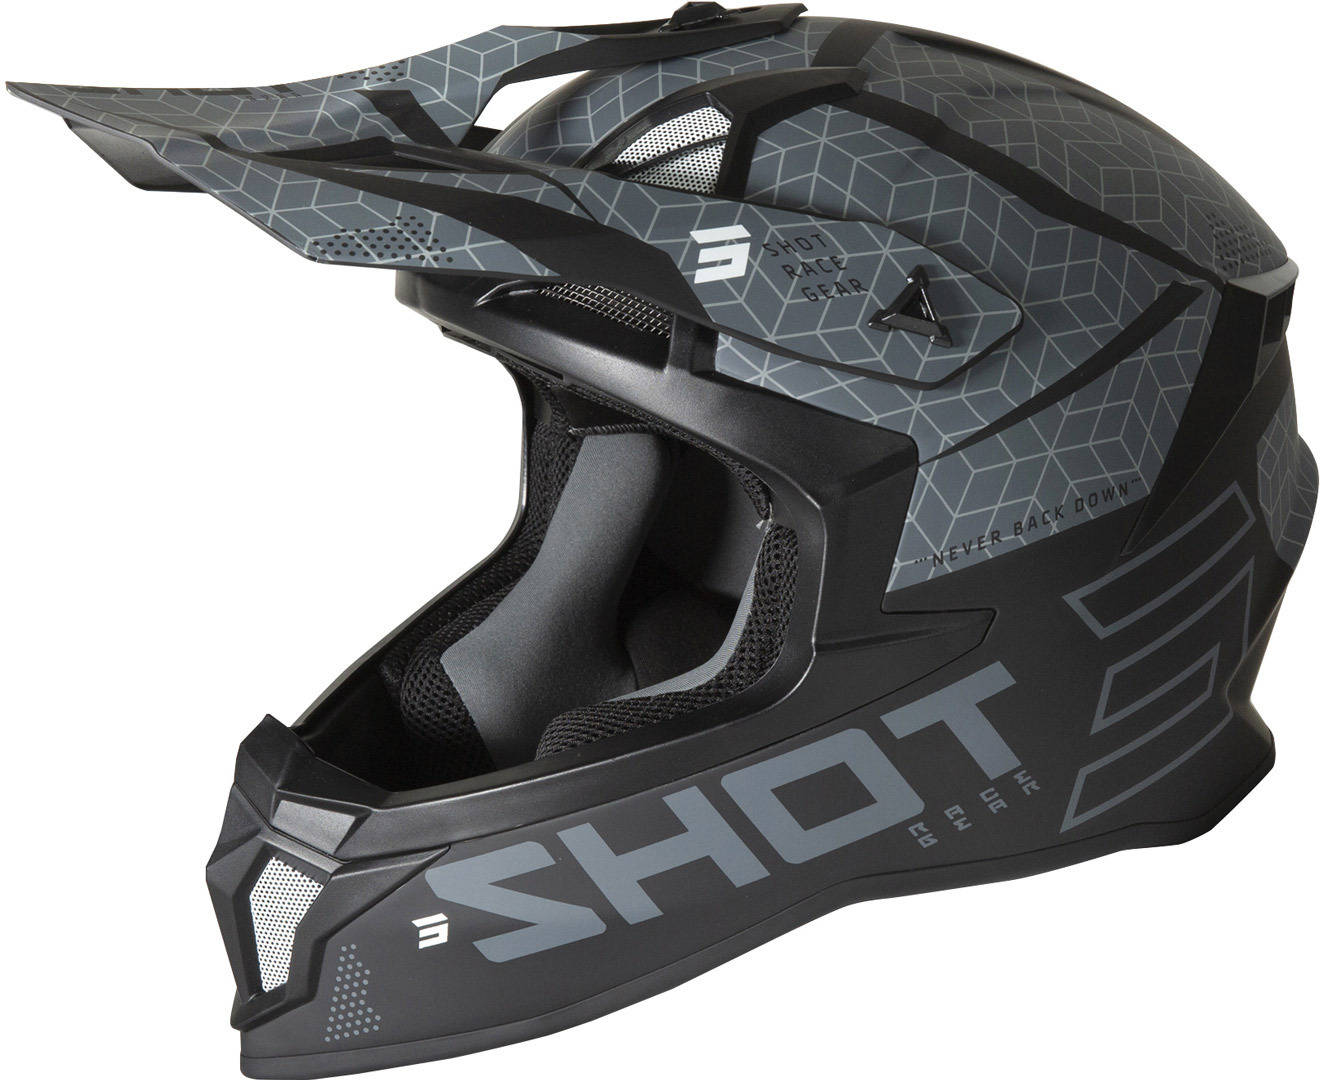 Shot Lite Core Motocross Helm, schwarz-grau, Größe M, schwarz-grau, Größe M